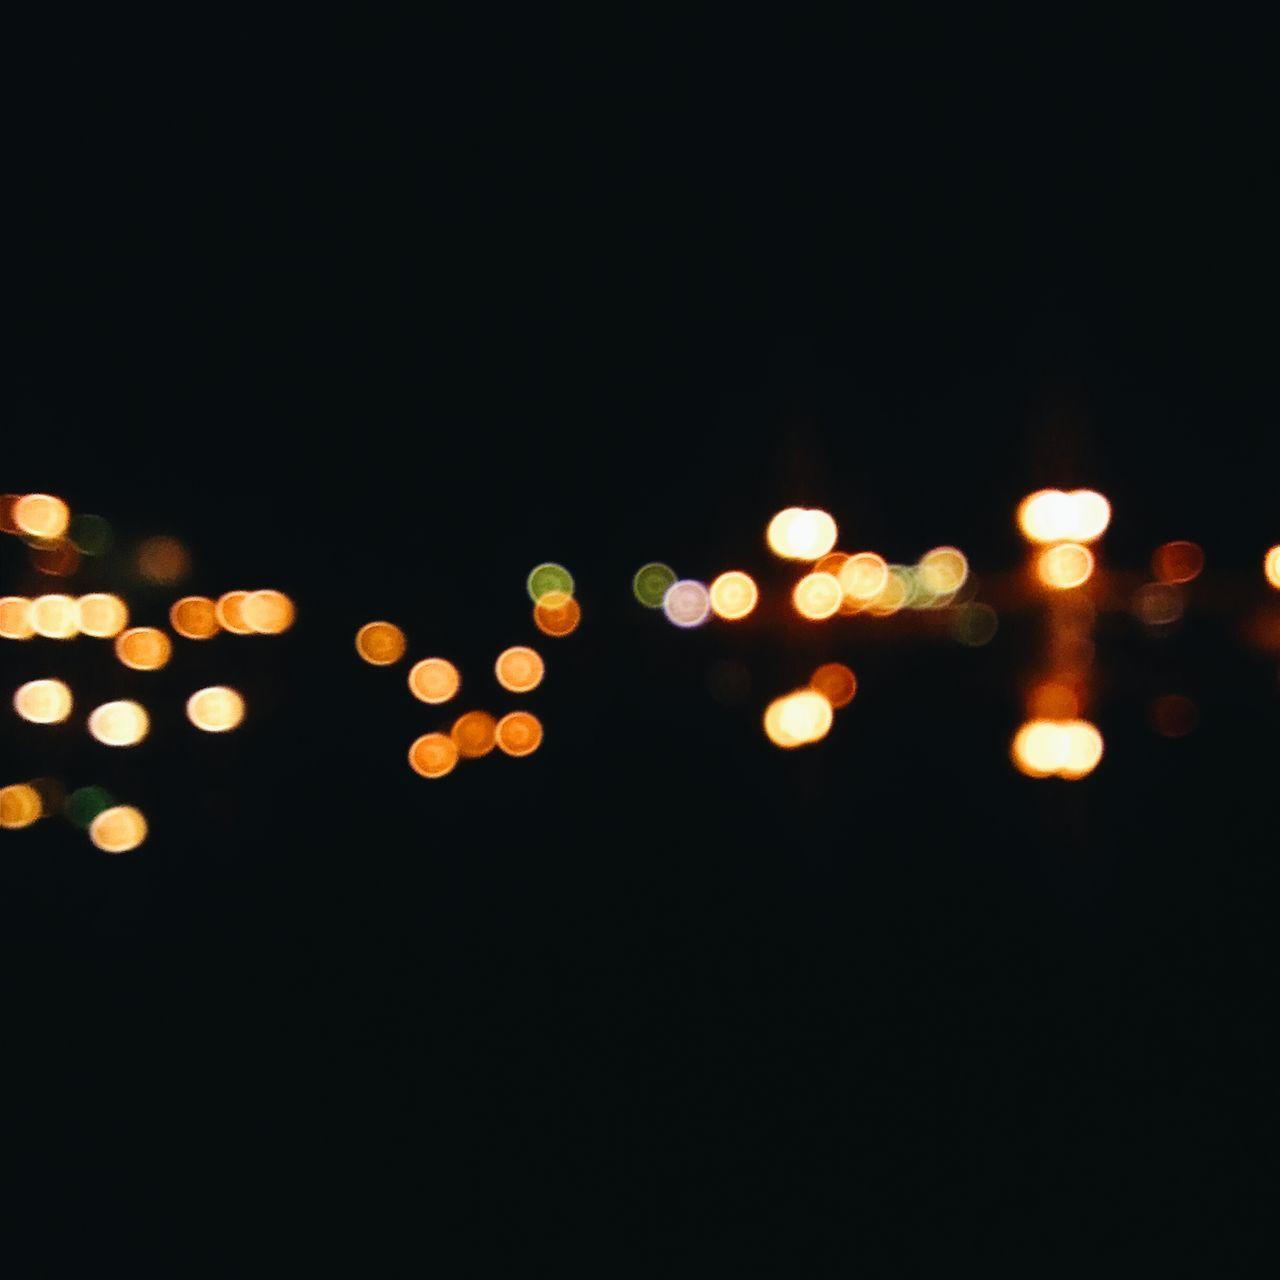 illuminated, night, defocused, no people, outdoors, black background, sky